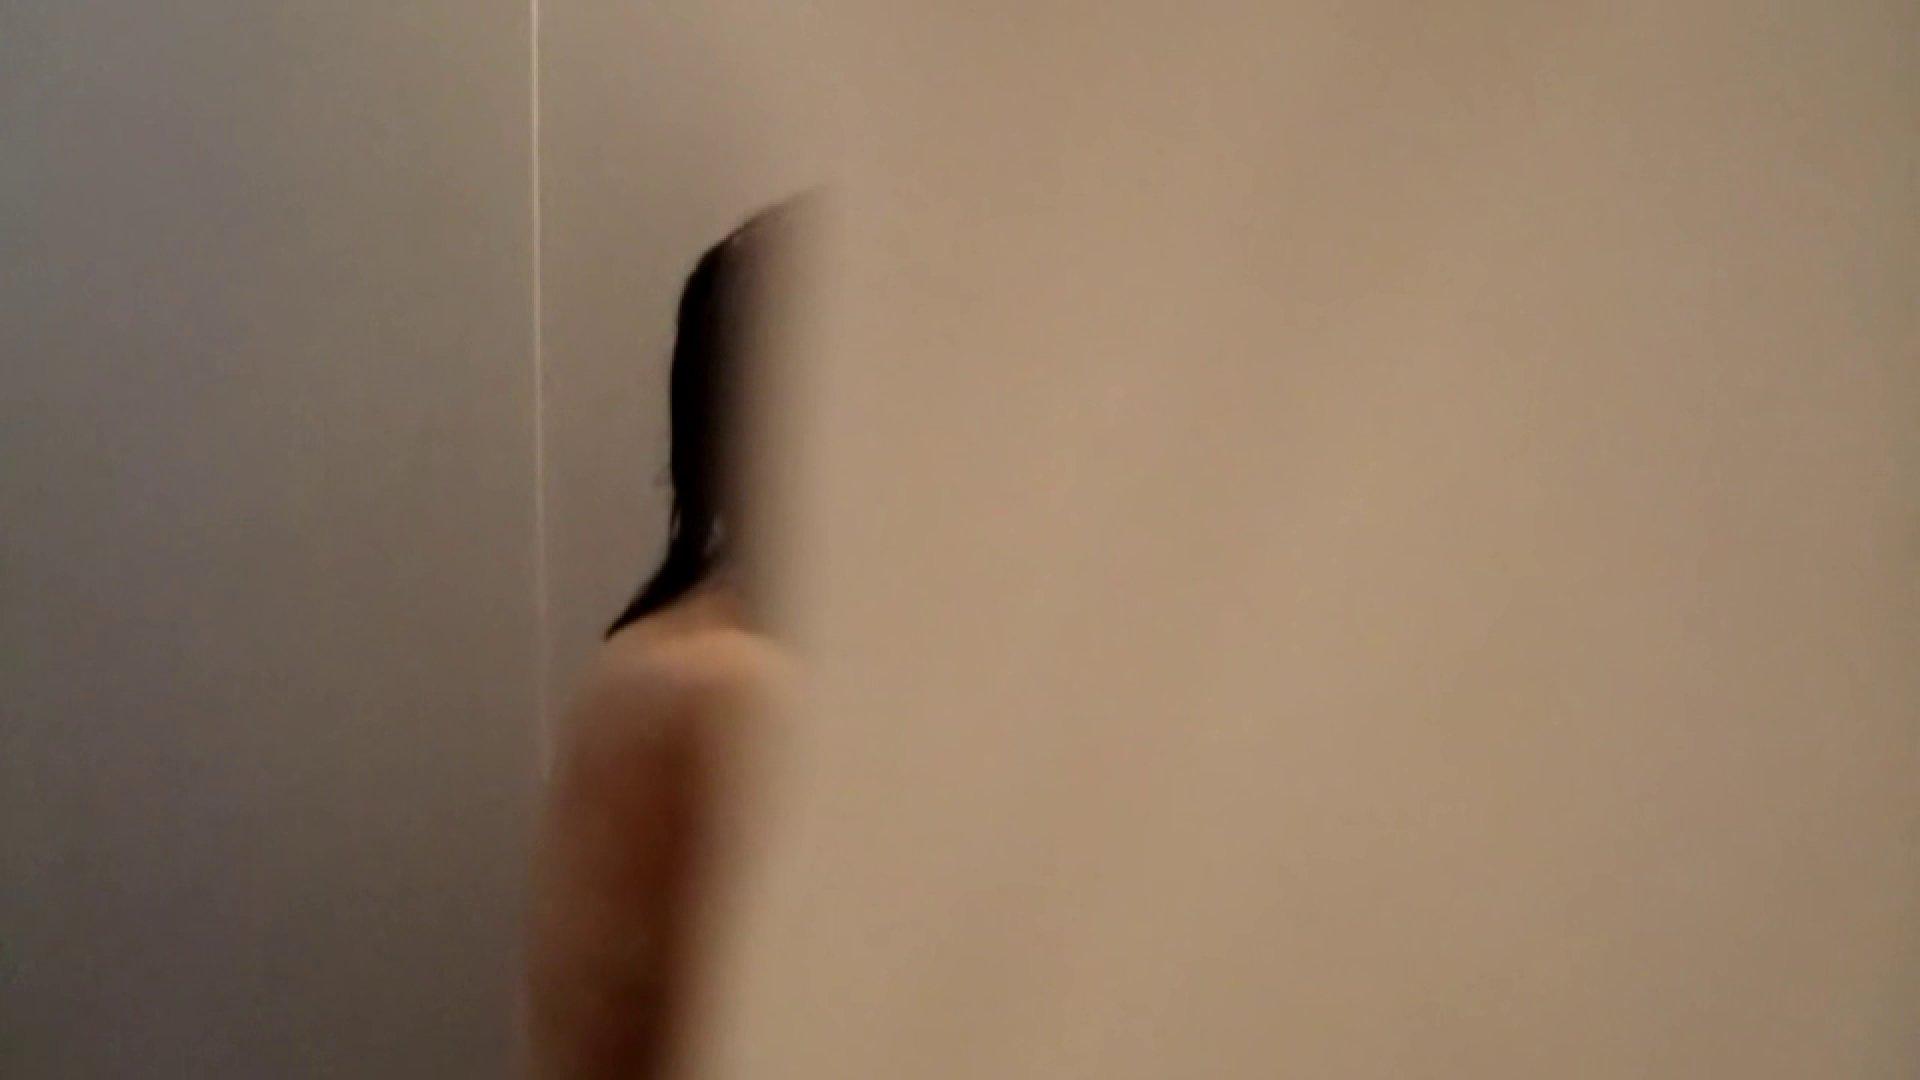 vol.2 葵のグラドル顔負けの爆乳を入浴シーンでどうぞ。 巨乳 エロ無料画像 111画像 13